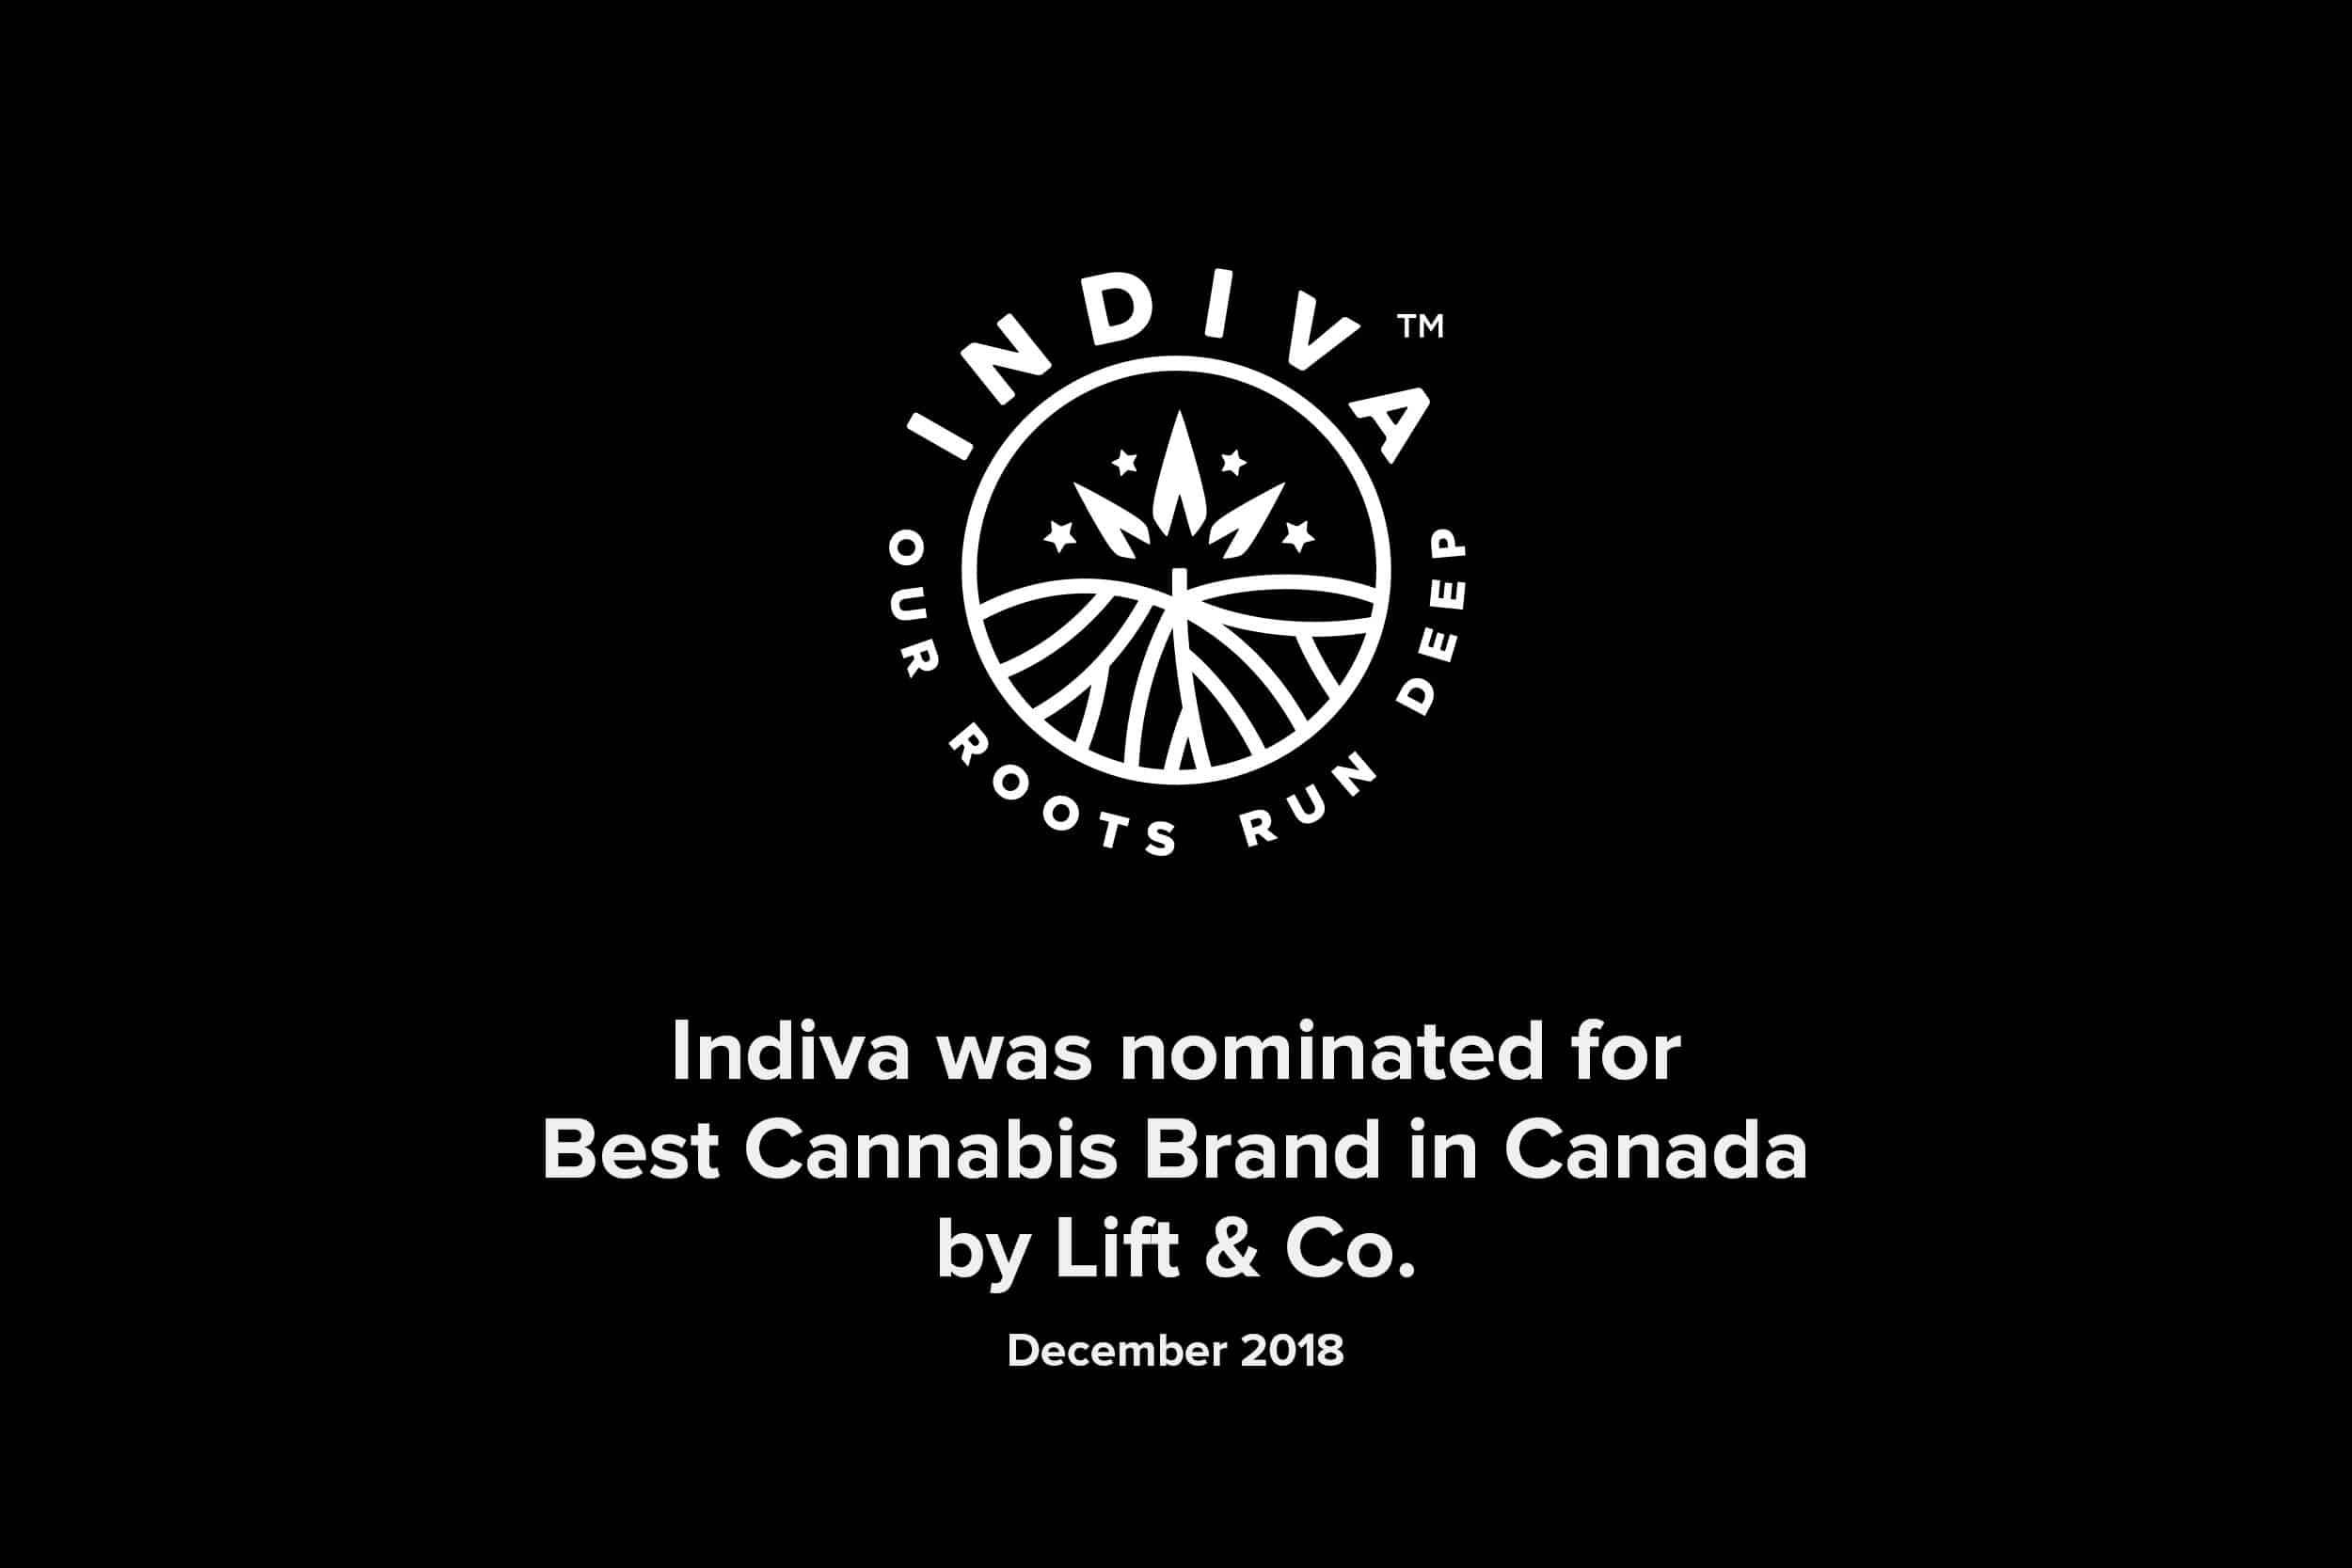 Best Cannabis Brand in Canada